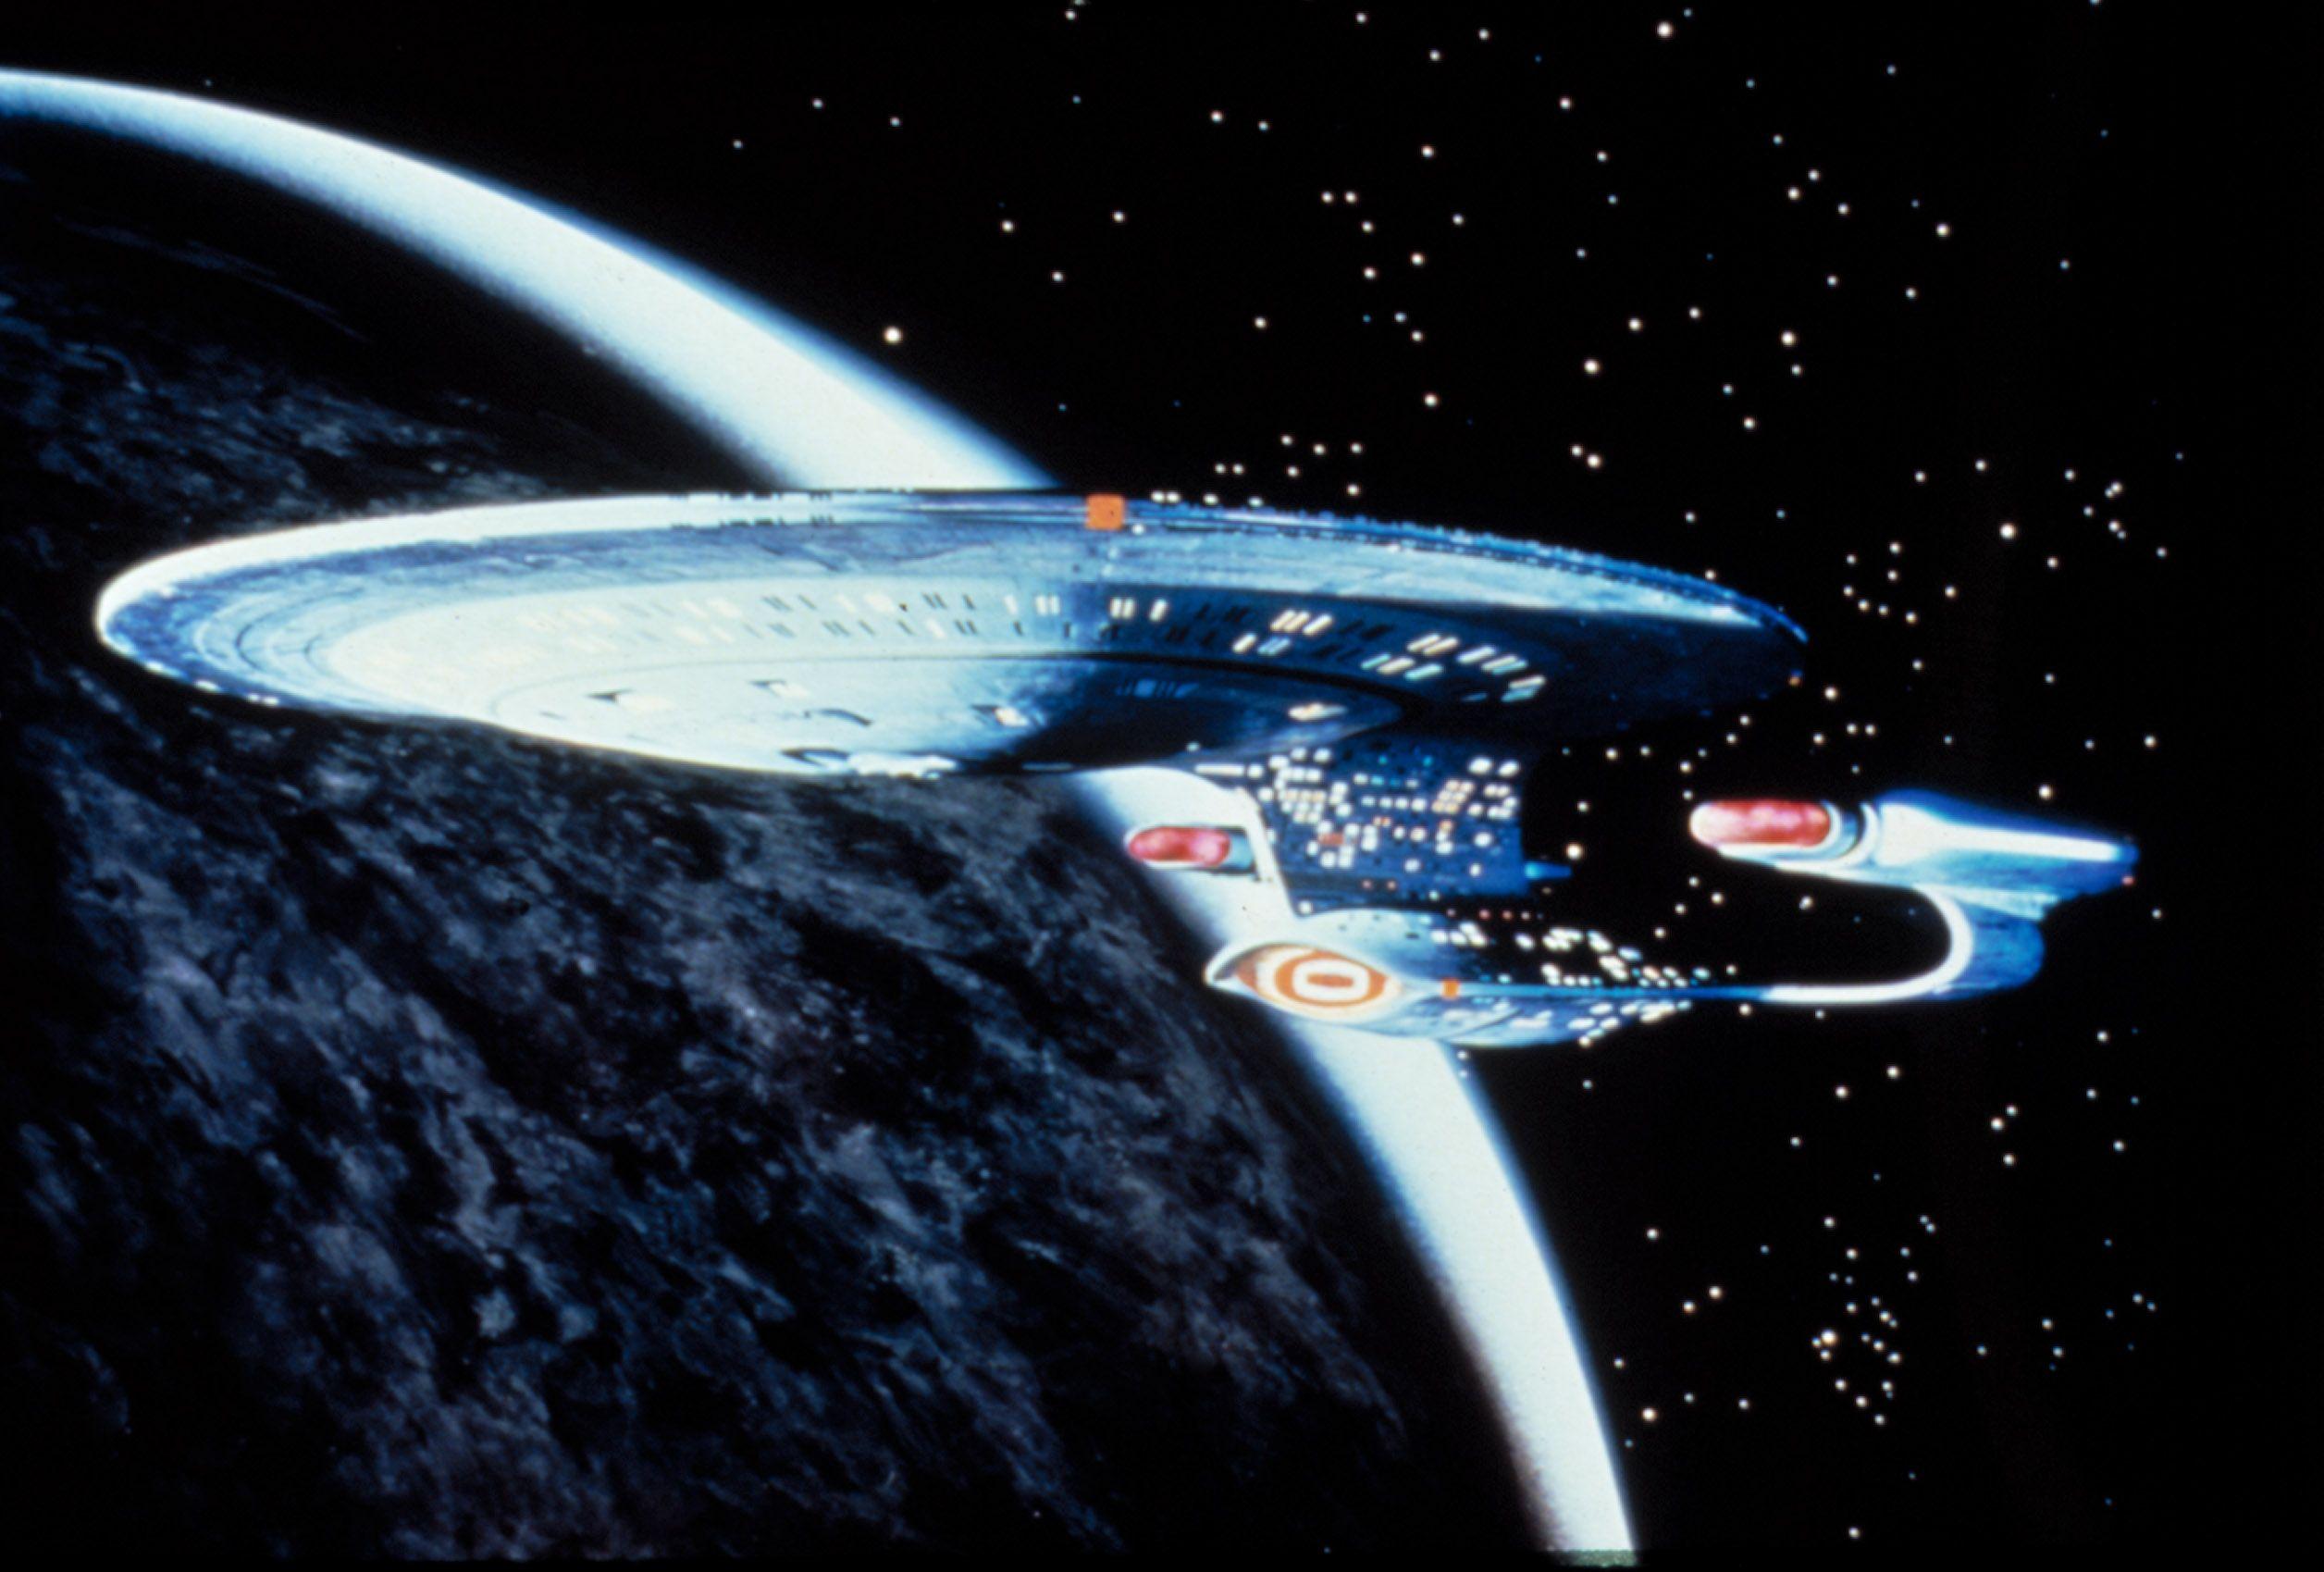 EntePic 11100 Star Trek Live Wallpaper space hd live wallpapers 2512x1699